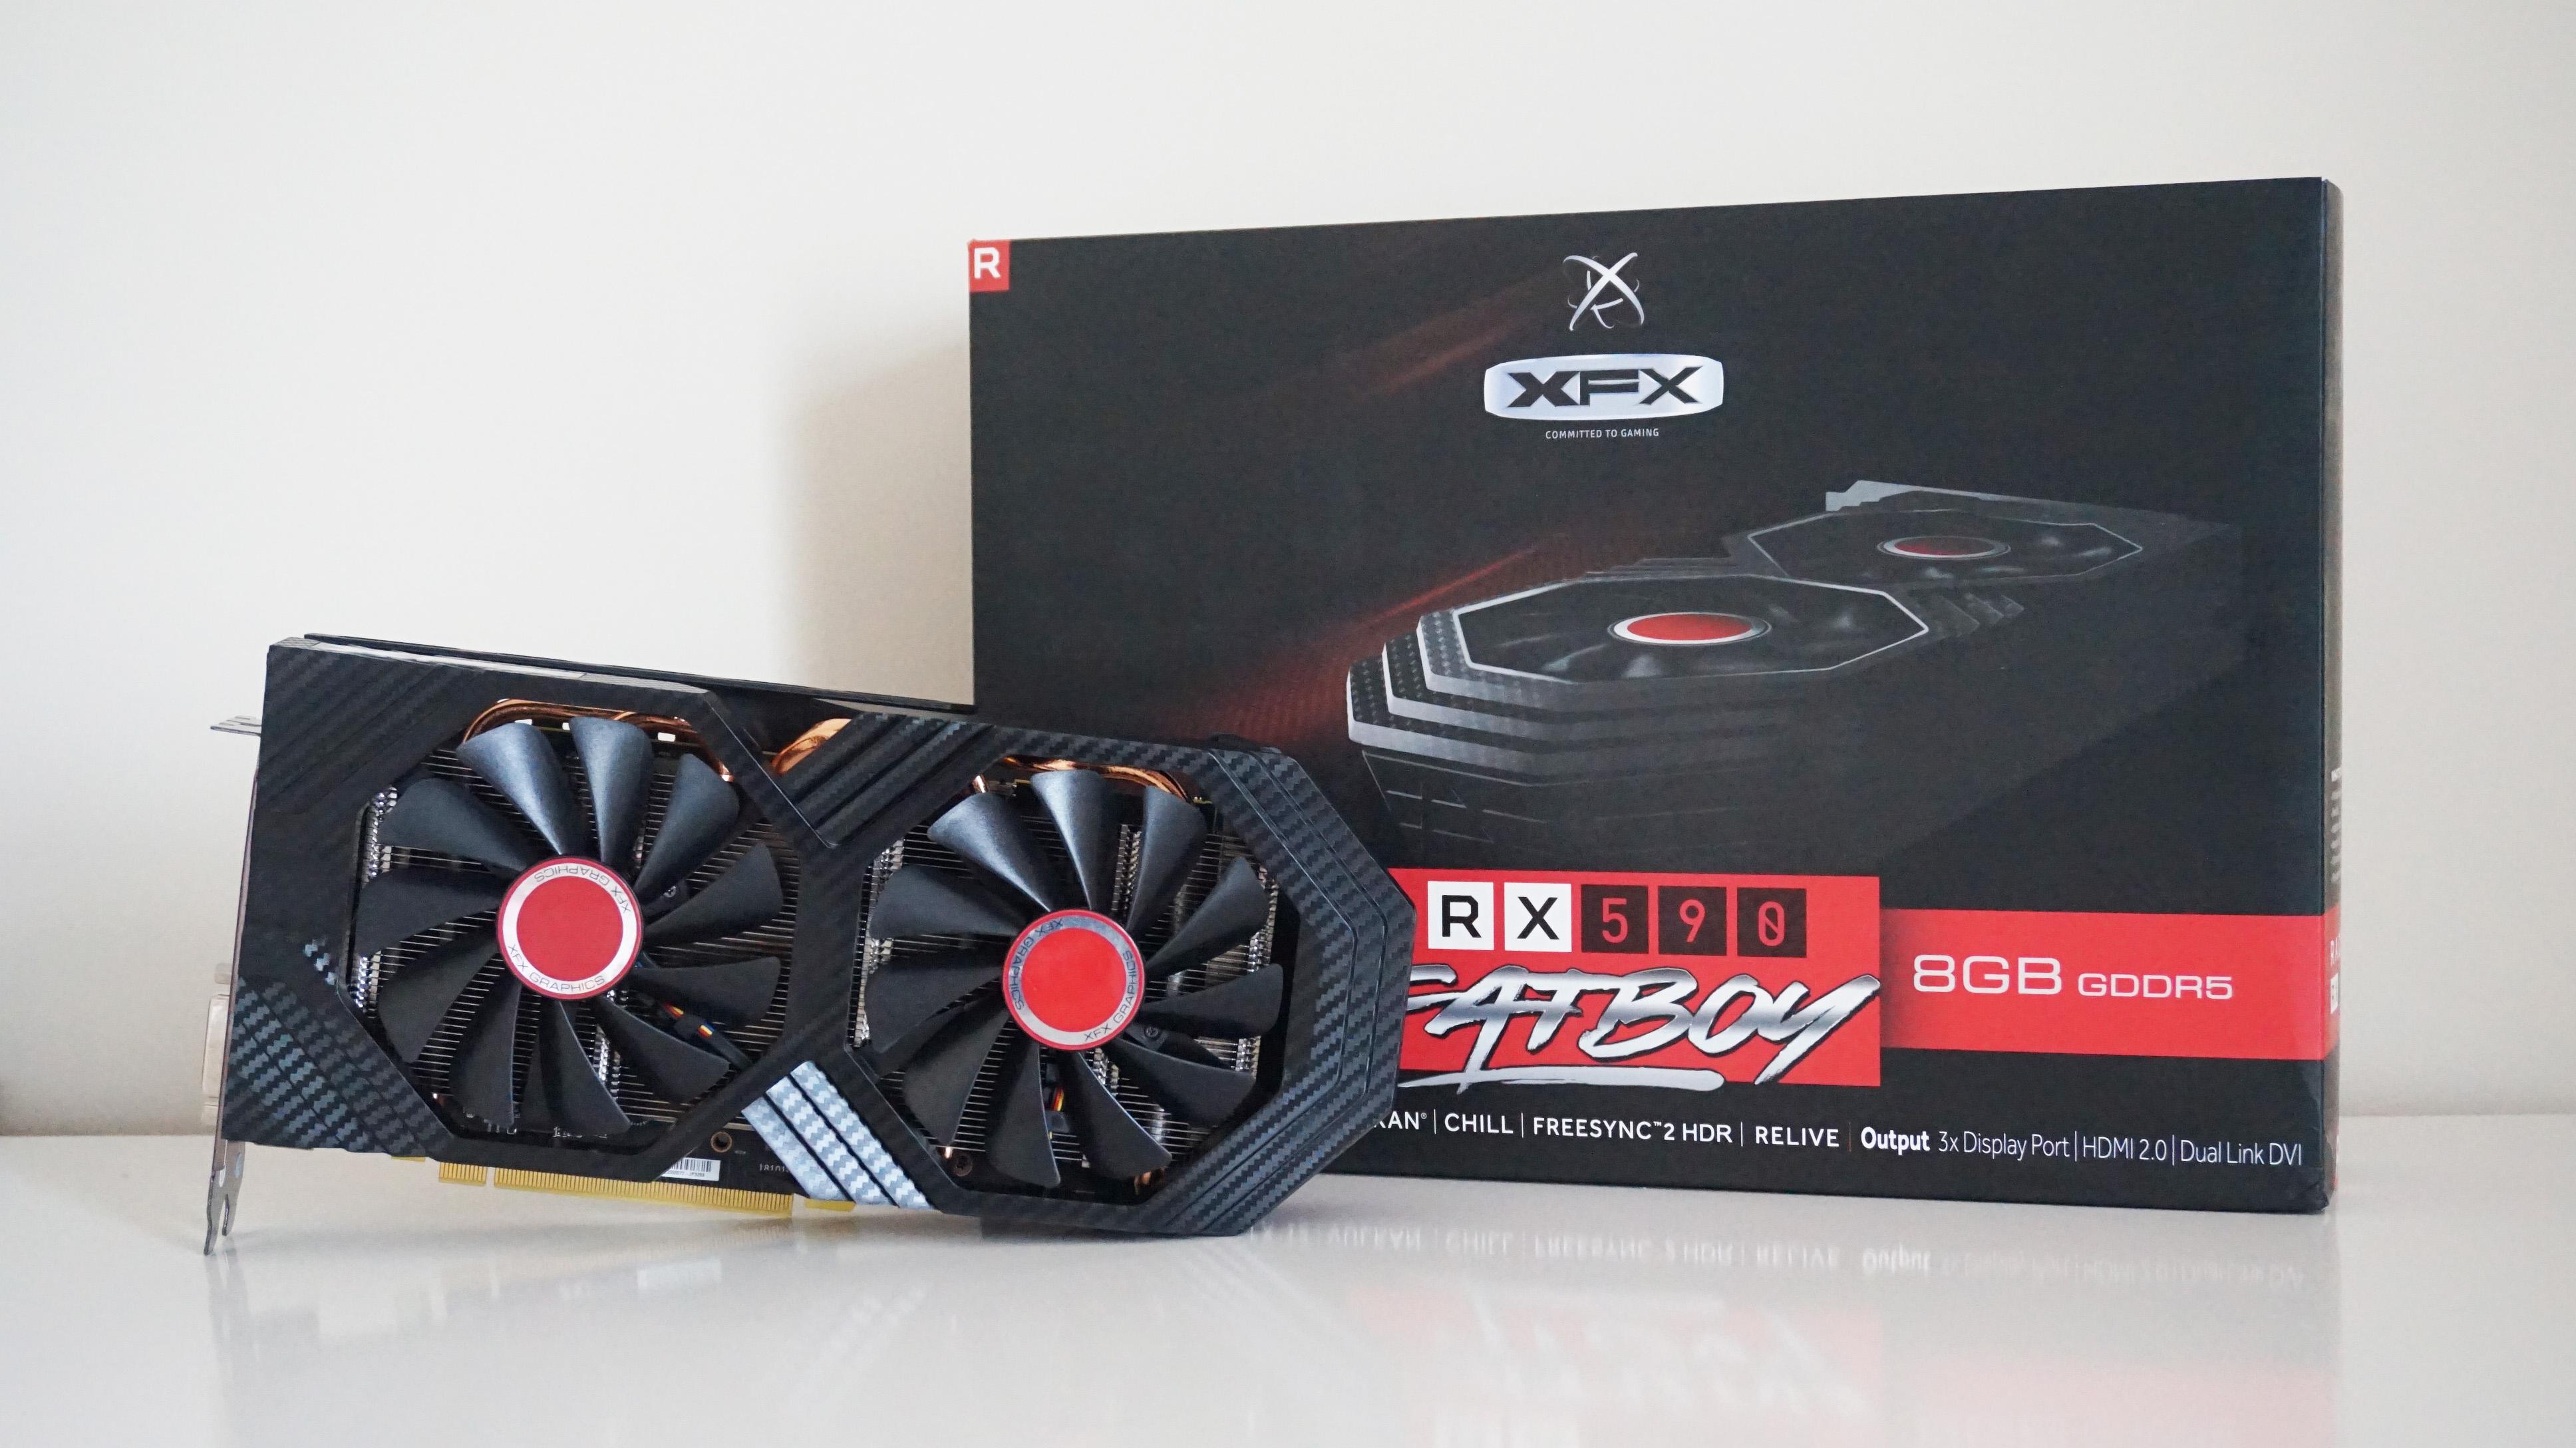 AMD Radeon RX 590 review: A GTX 1060 killer | Rock Paper Shotgun